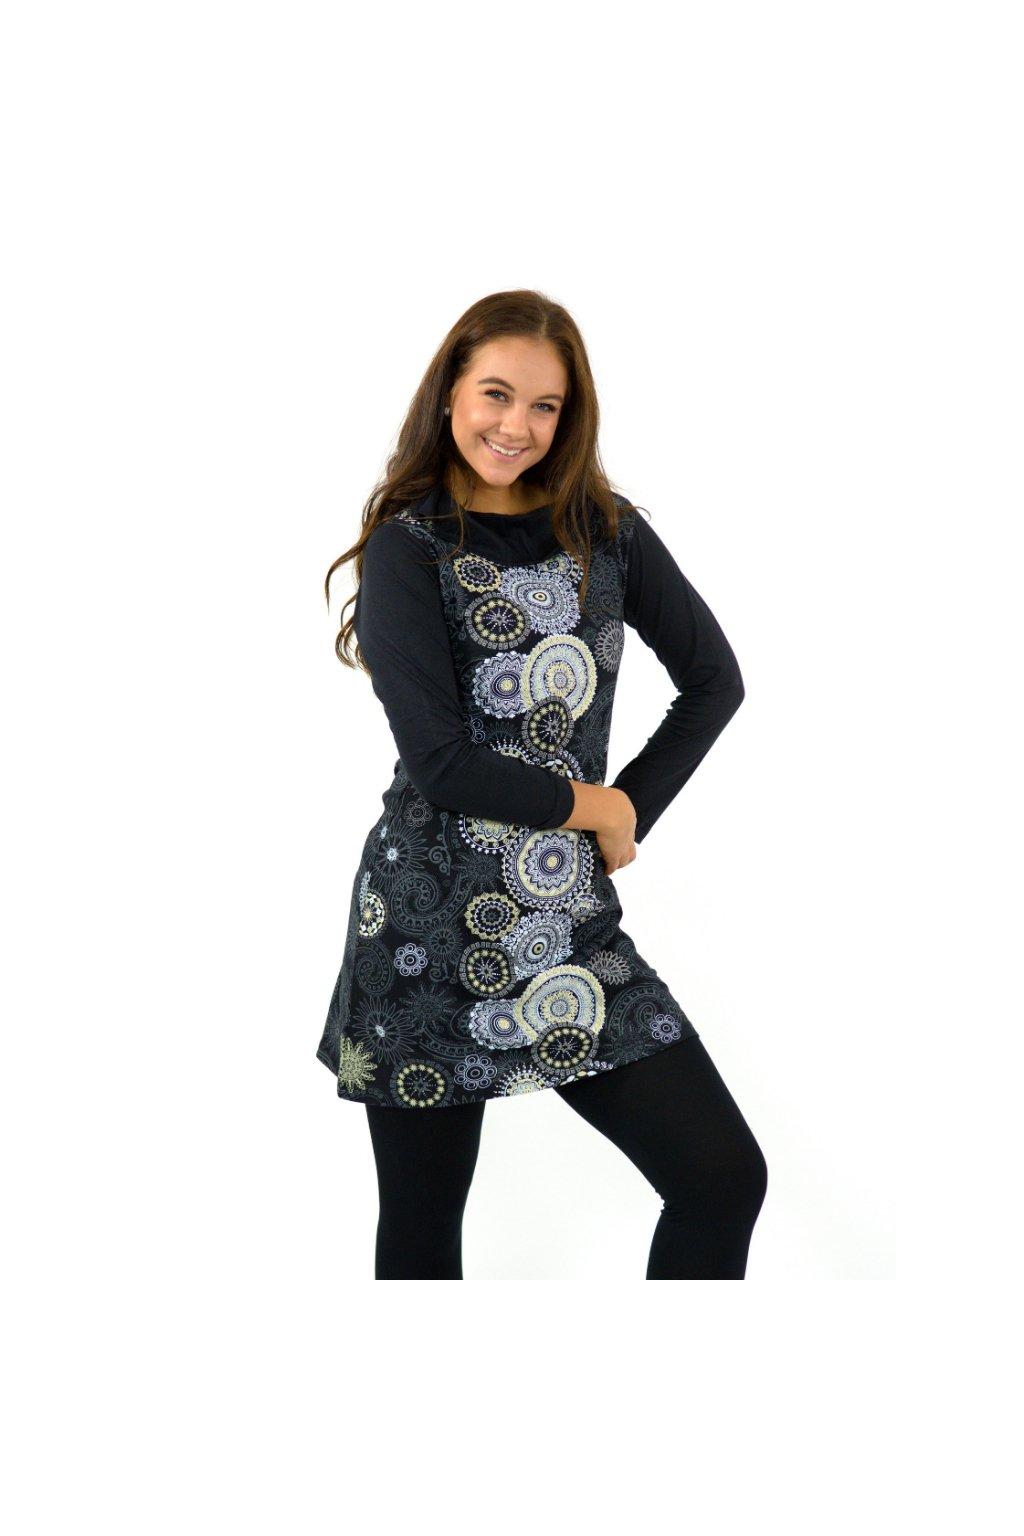 Tunika / šaty s límcem Sarita - černá s béžovou